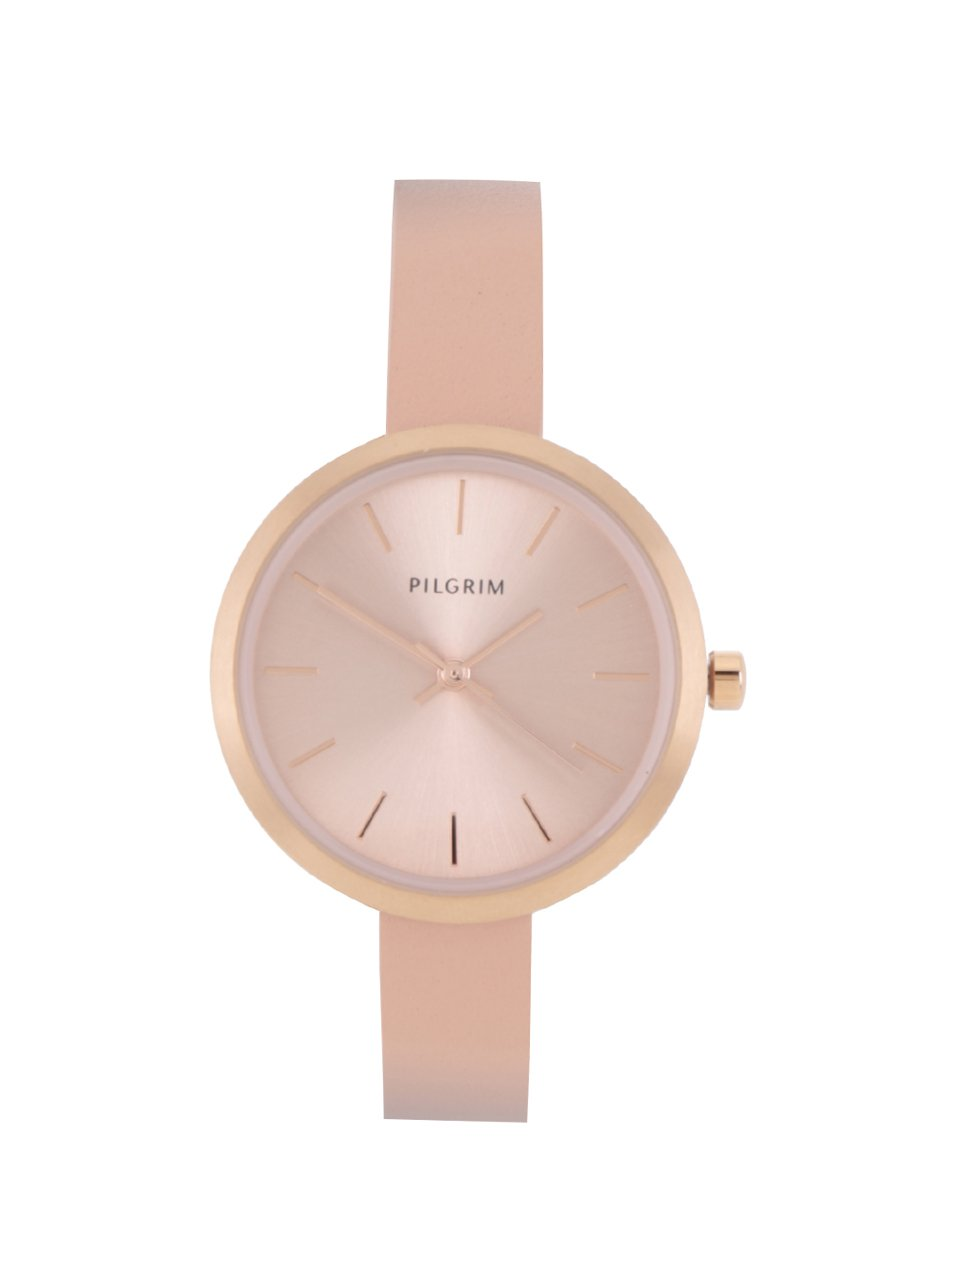 Dámské pozlacené hodinky v růžovozlaté barvě s koženým páskem Pilgrim